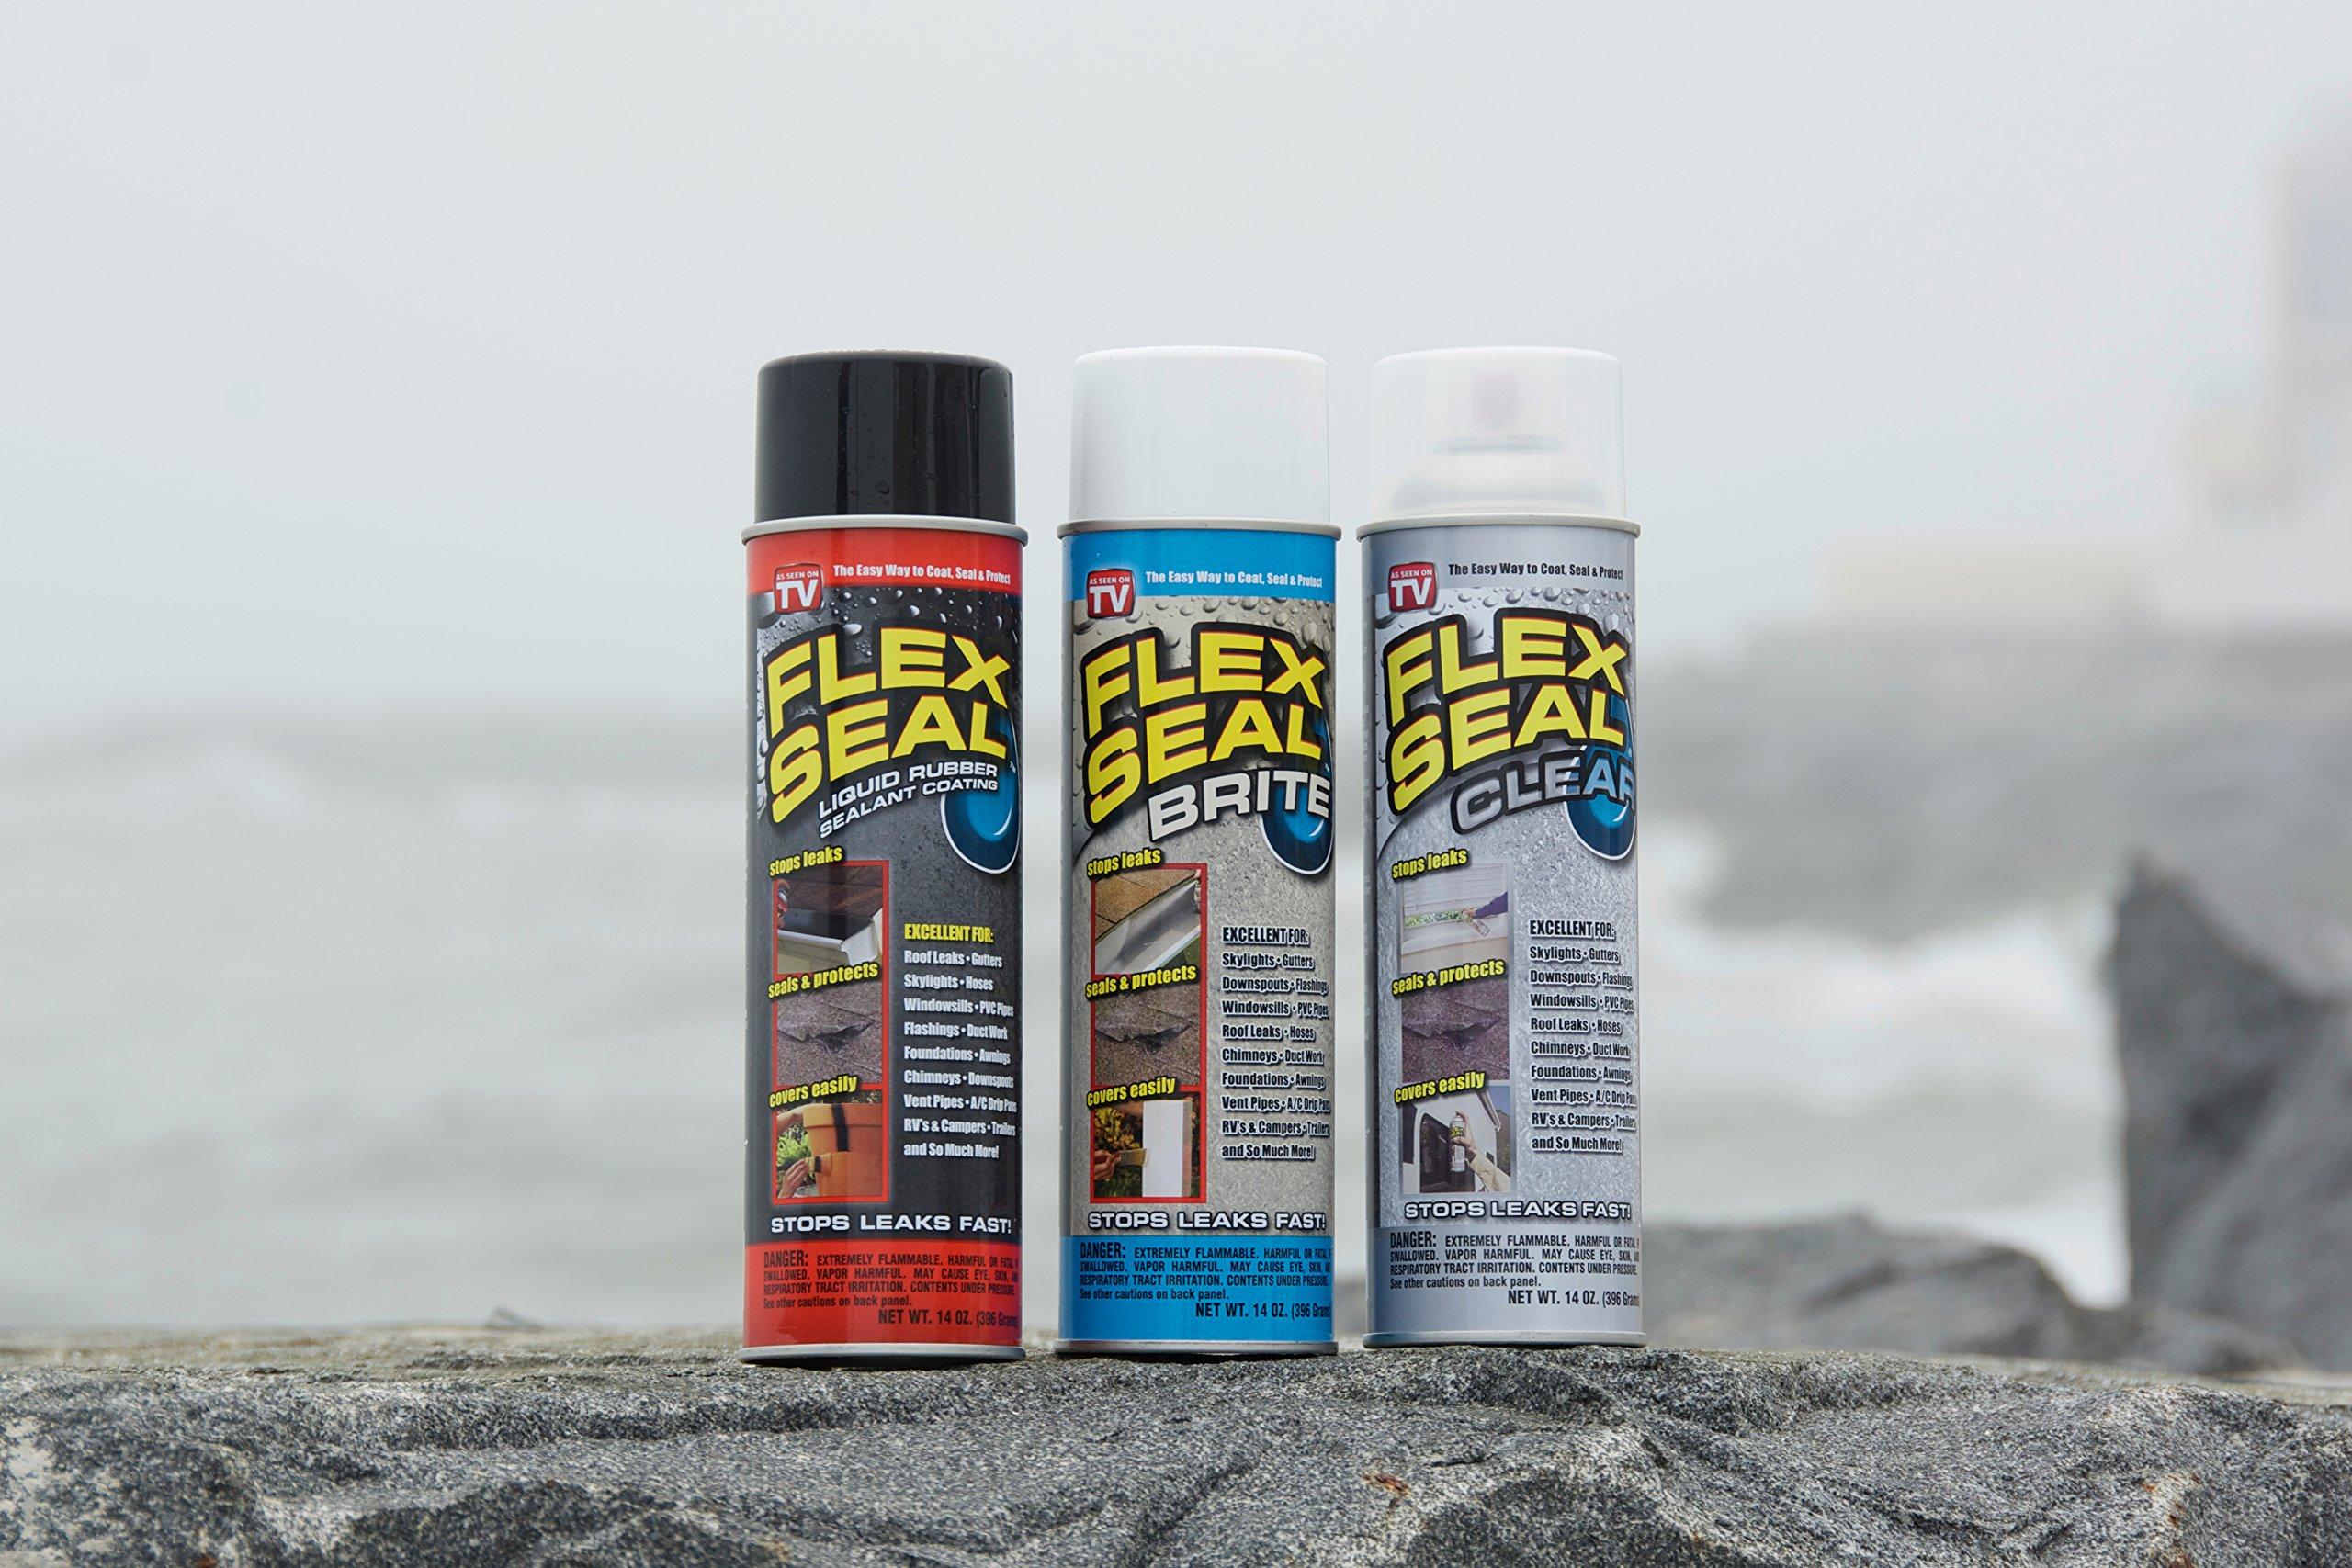 Flex Seal Spray Rubber Sealant Coating, 14-oz, Clear (2 Pack